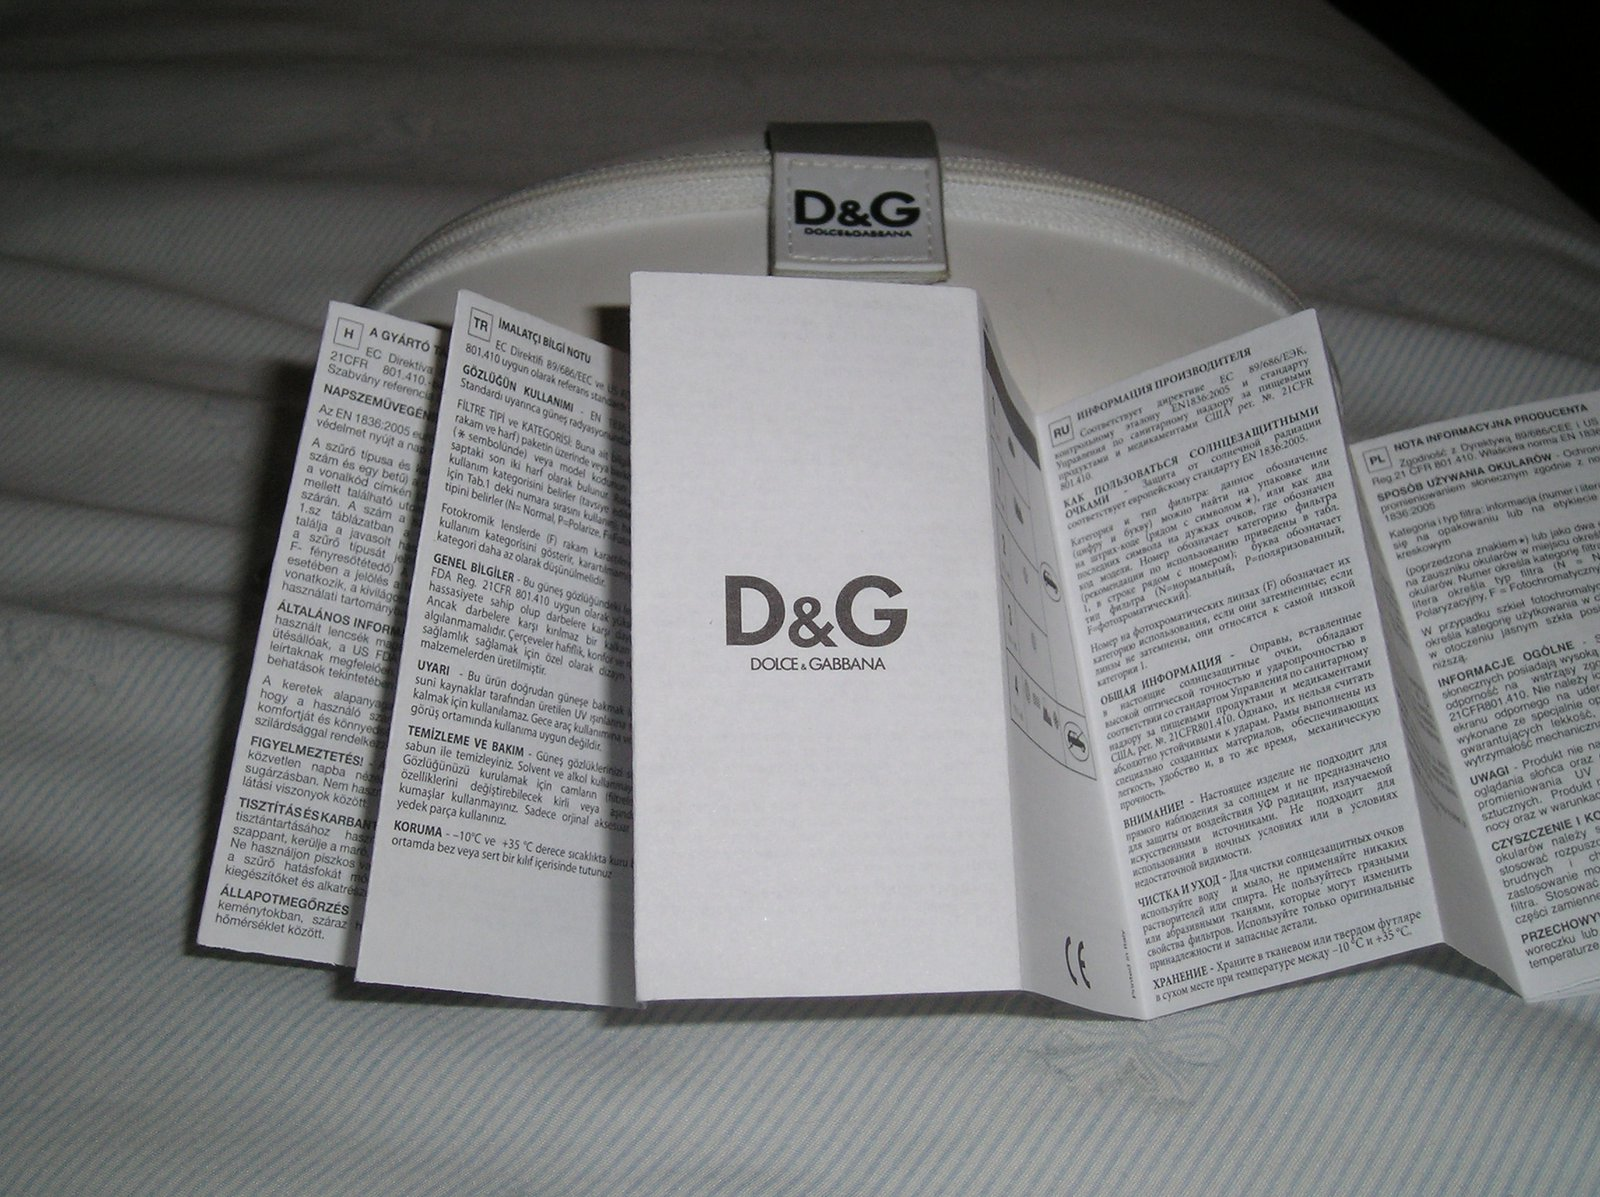 Dg proof 3